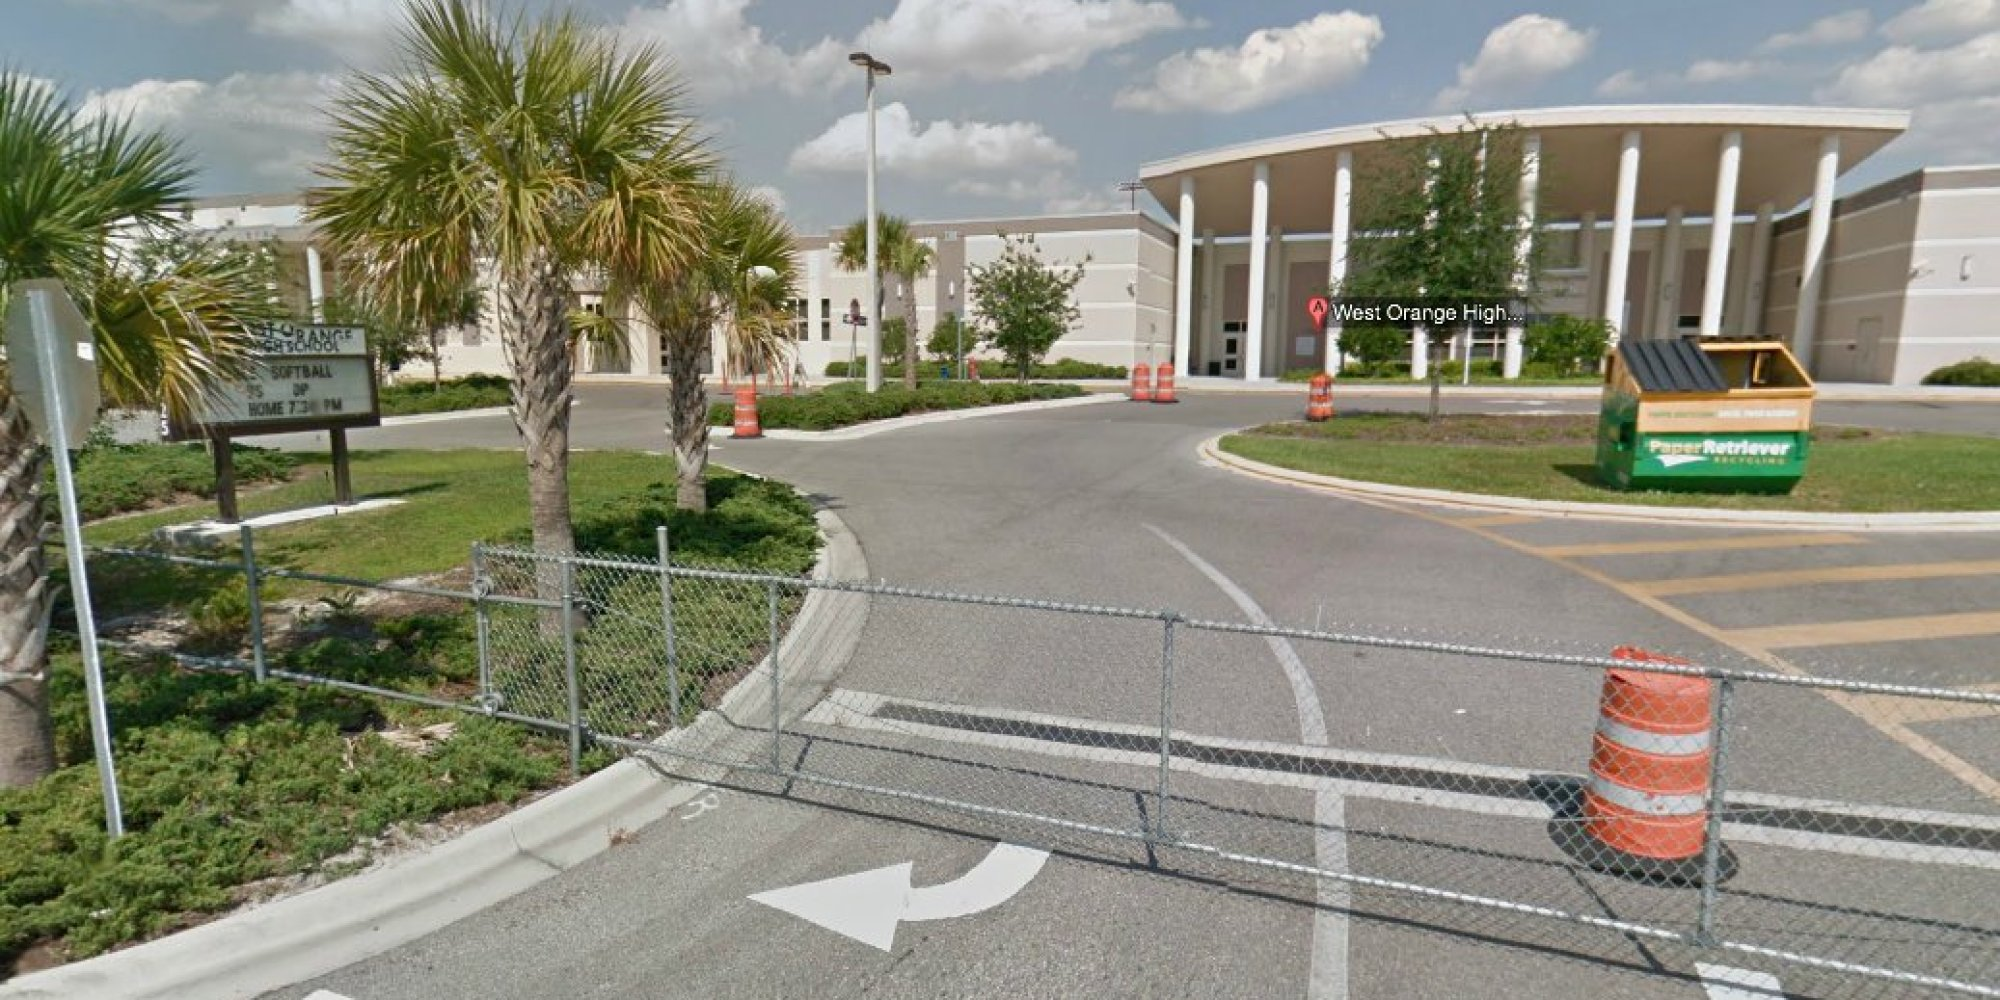 Student shot at west orange high school in winter garden florida huffpost for Winter garden fl news